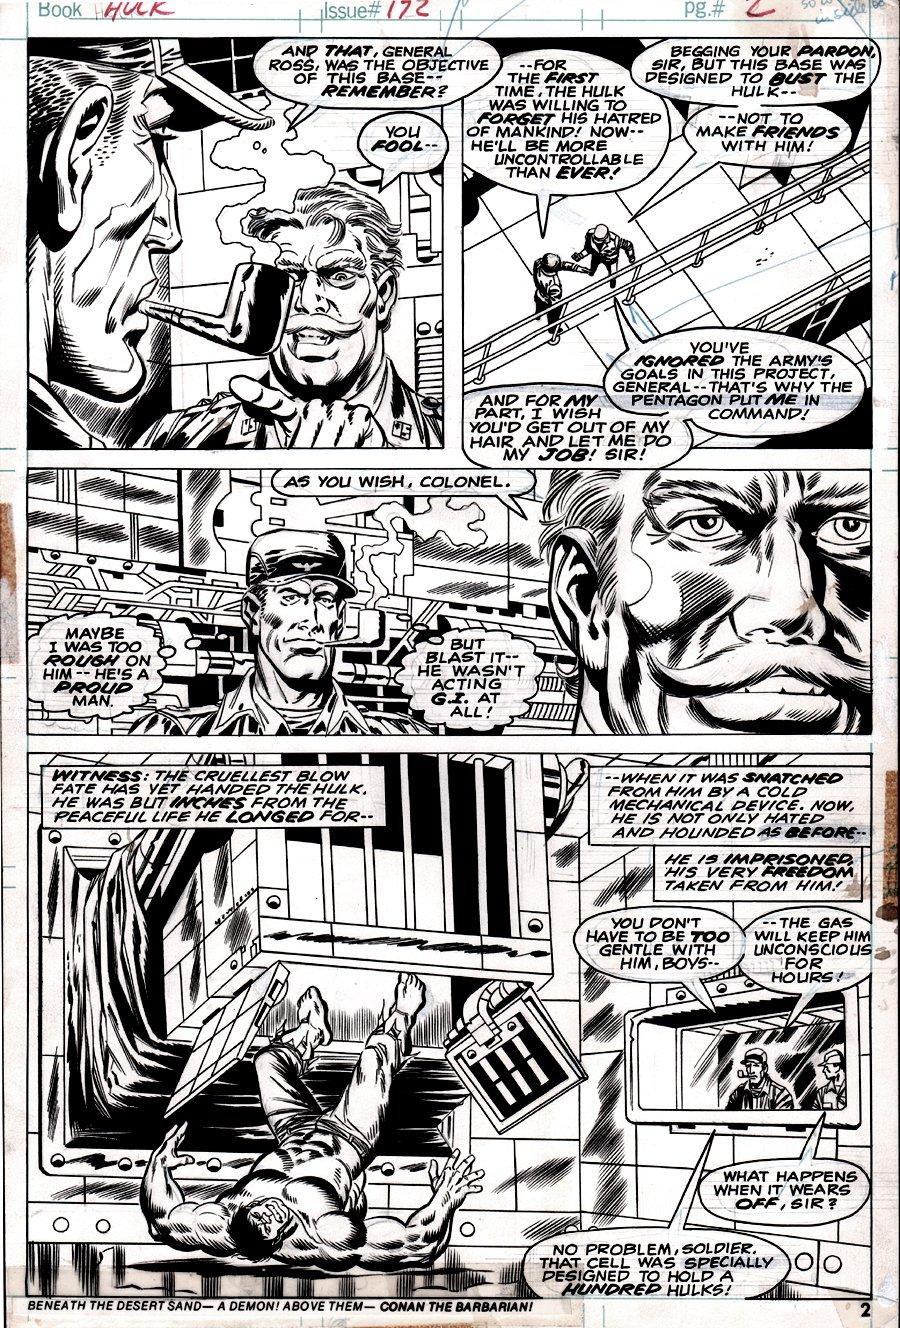 Incredible Hulk #172 p 2 (THUNDERBOLT ROSS CAPTURES THE HULK!) 1973